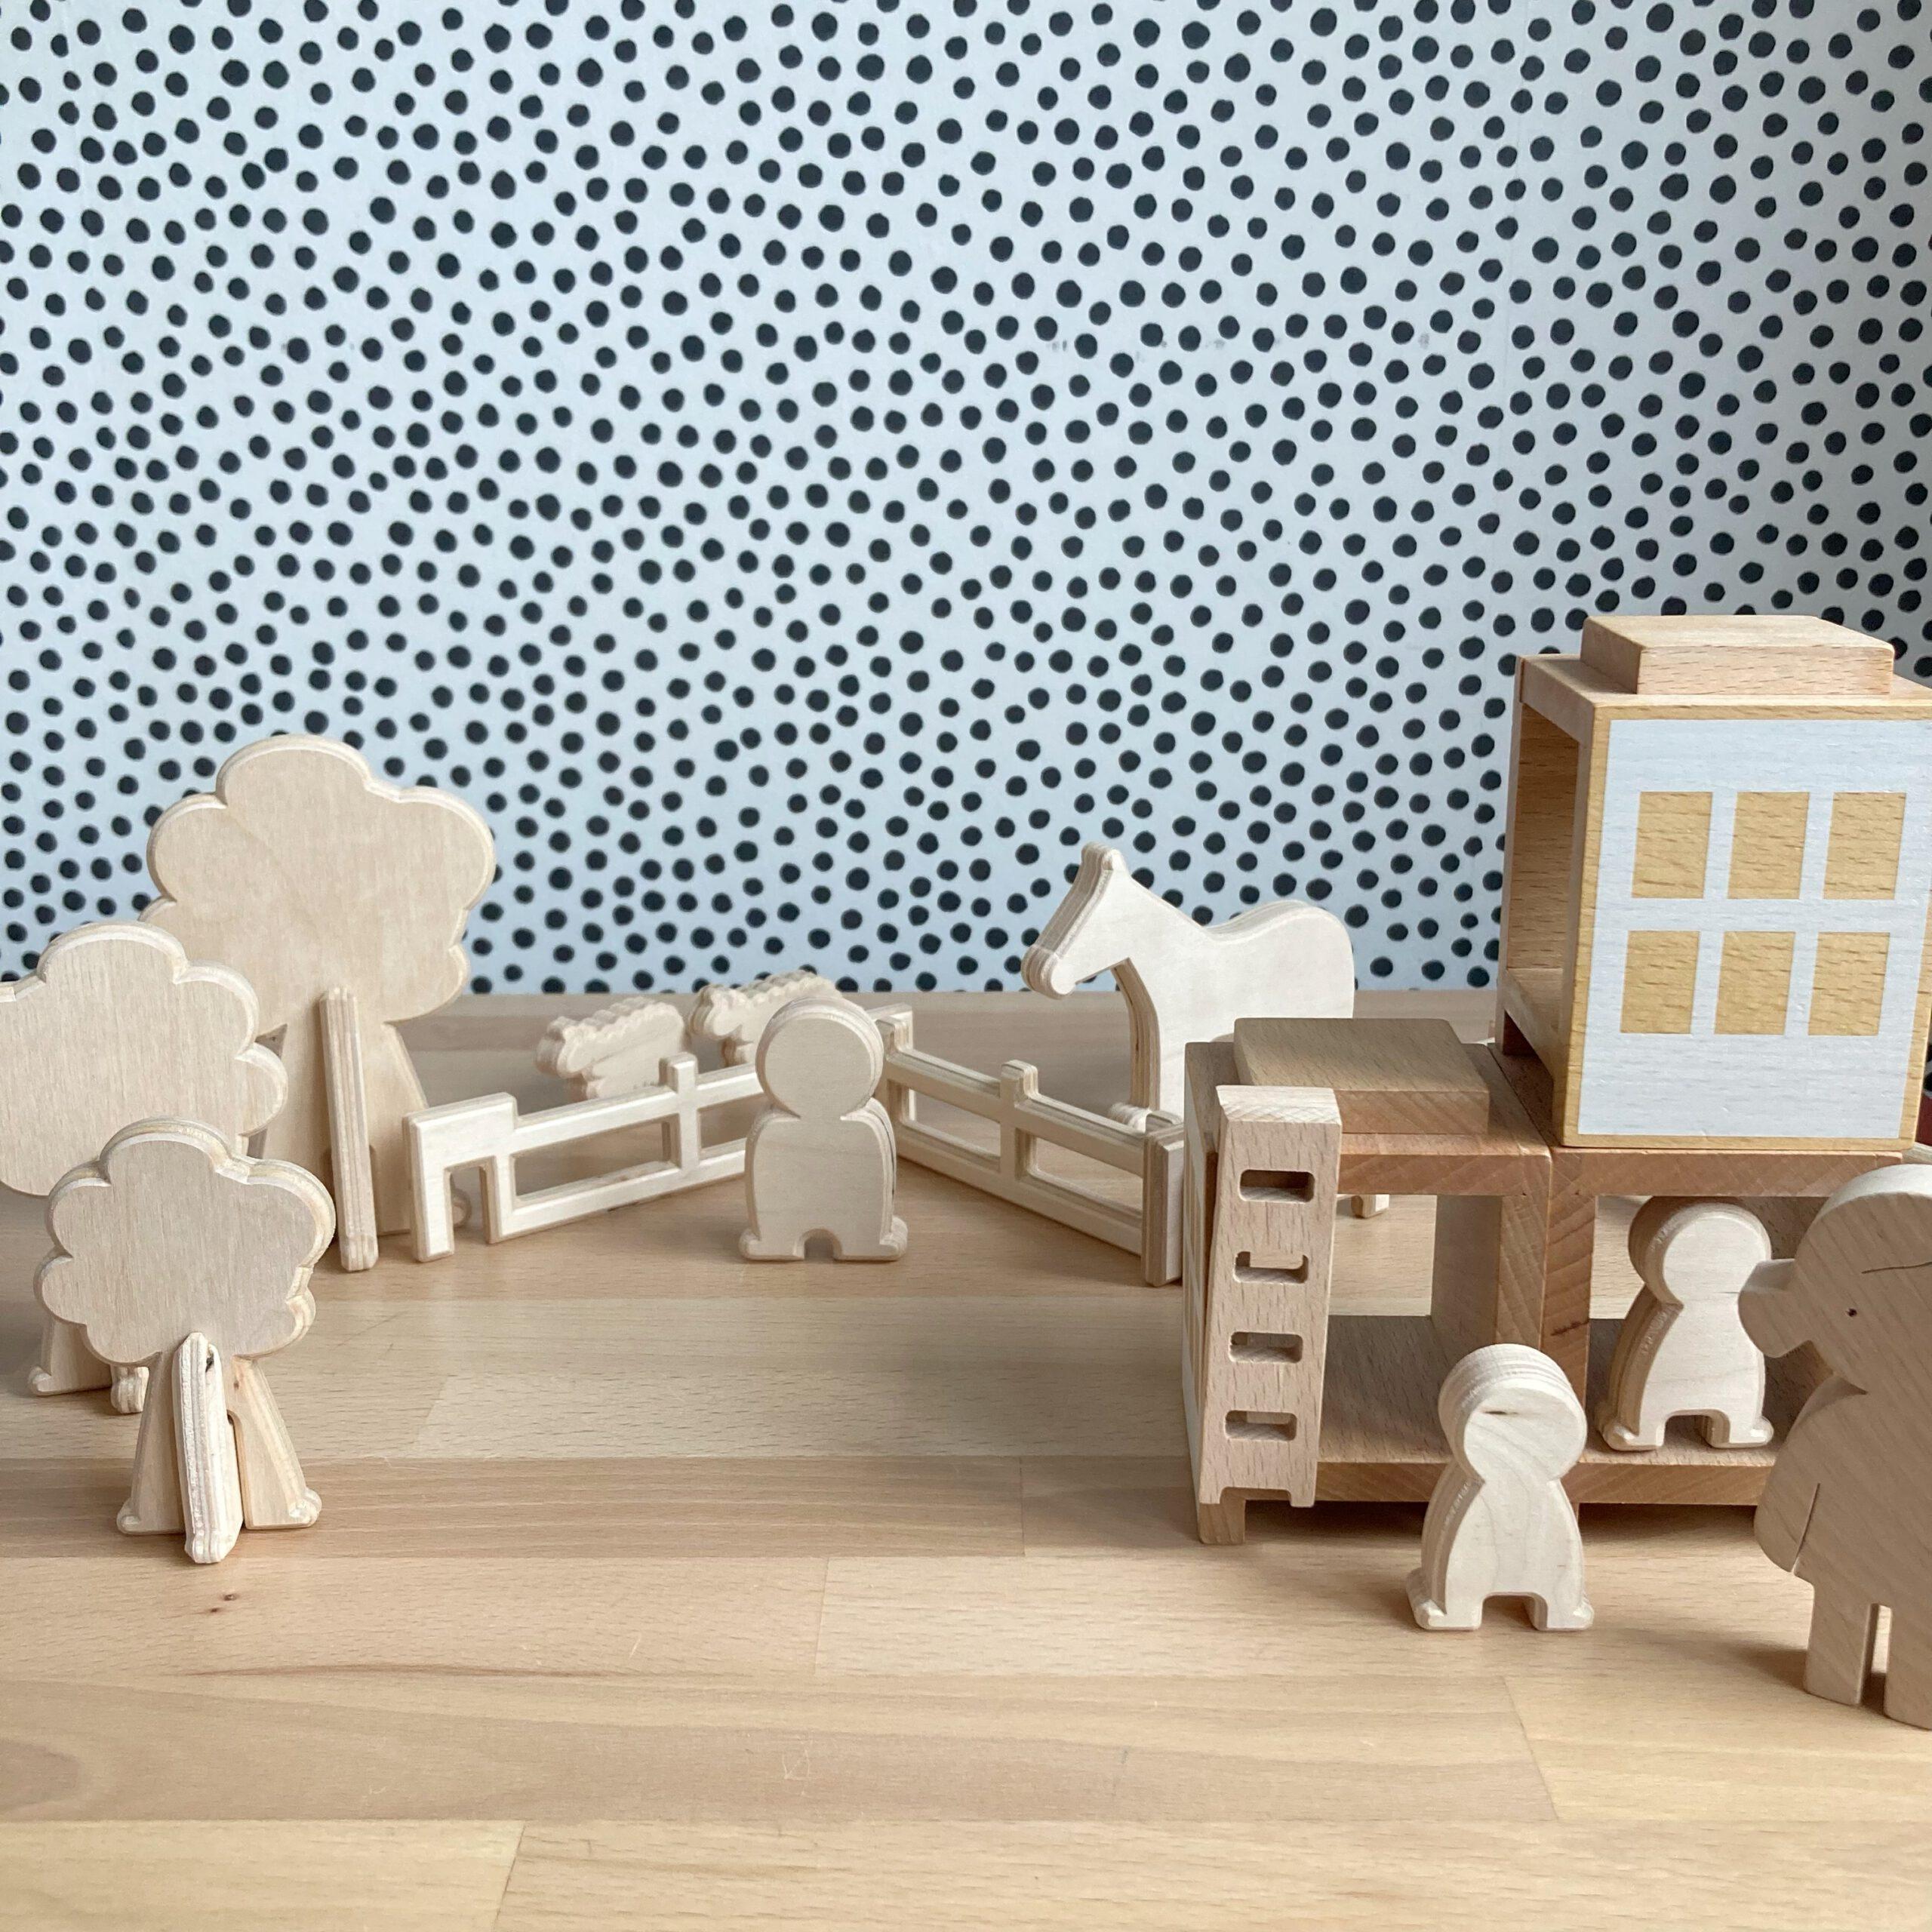 duurzaam houten speelgoed boerderij lovelties